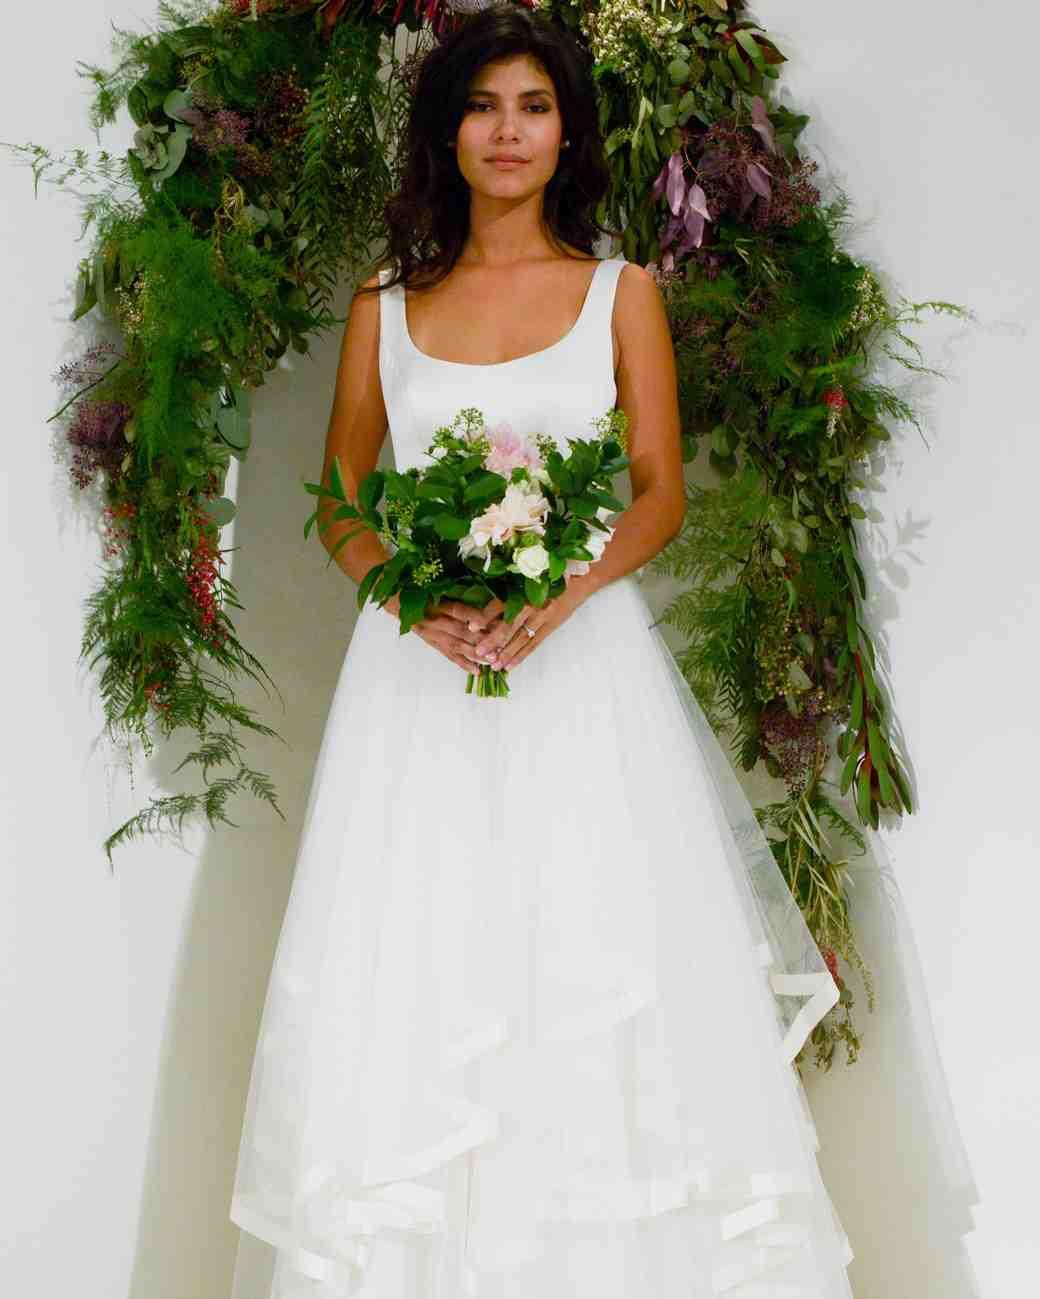 Disney Wedding Gown Collection 82 Stunning Wtoo Fall Wedding Dress